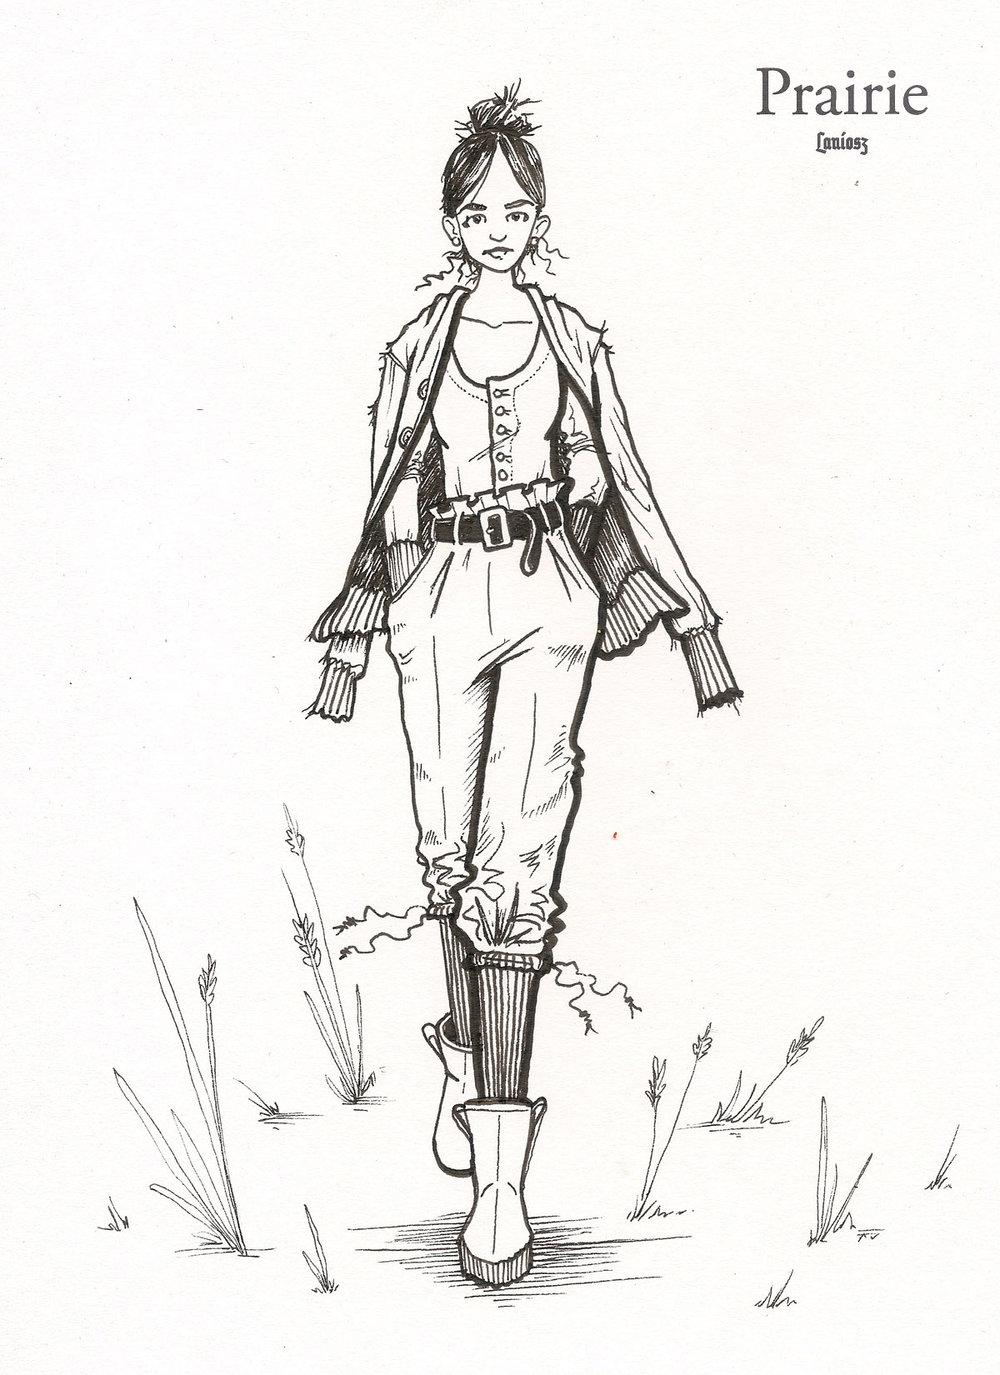 laniosz-prairie-sketch-2.jpg